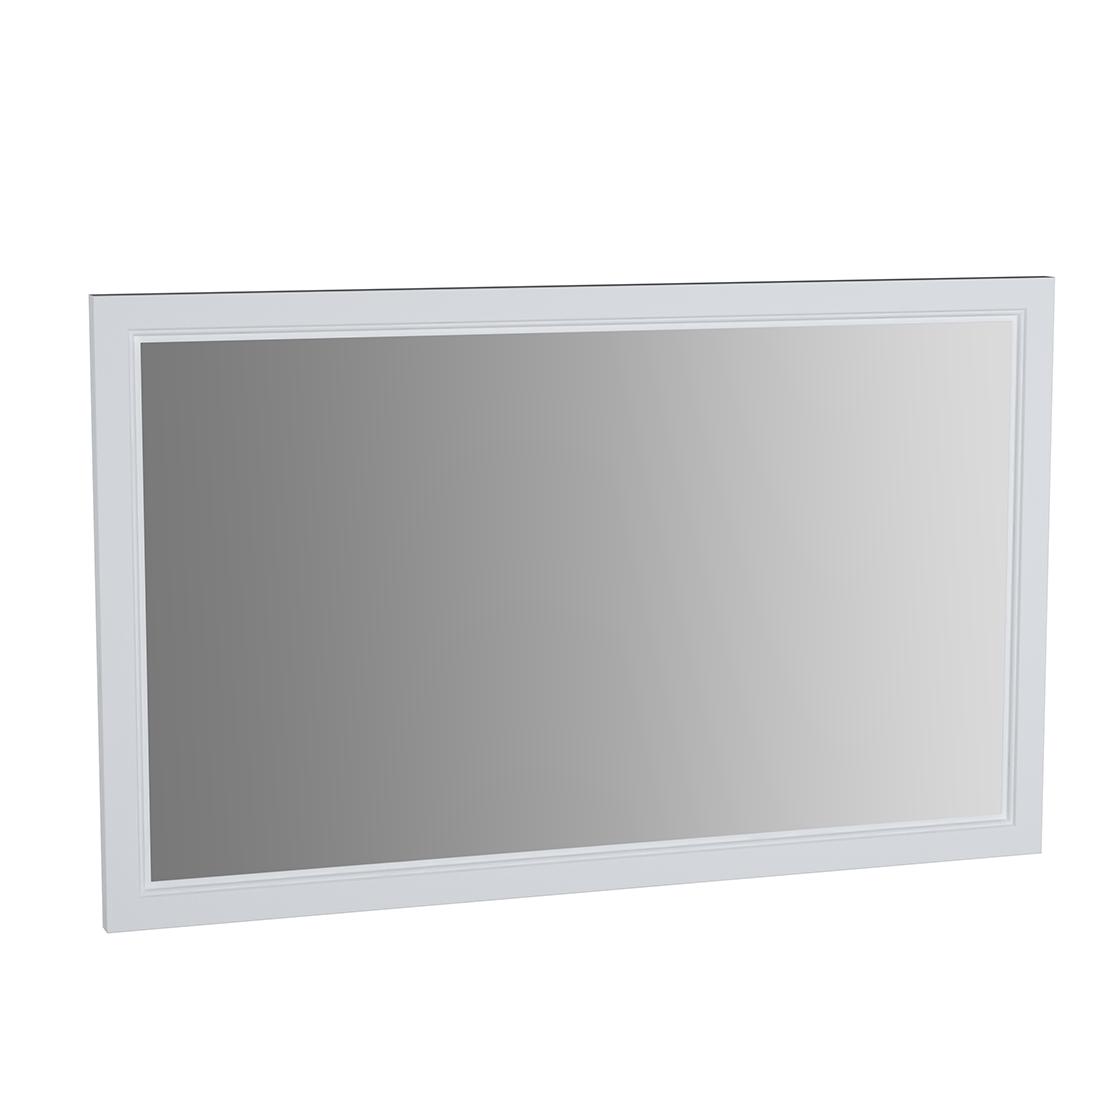 Valarte miroir, 120 cm, blanc mat